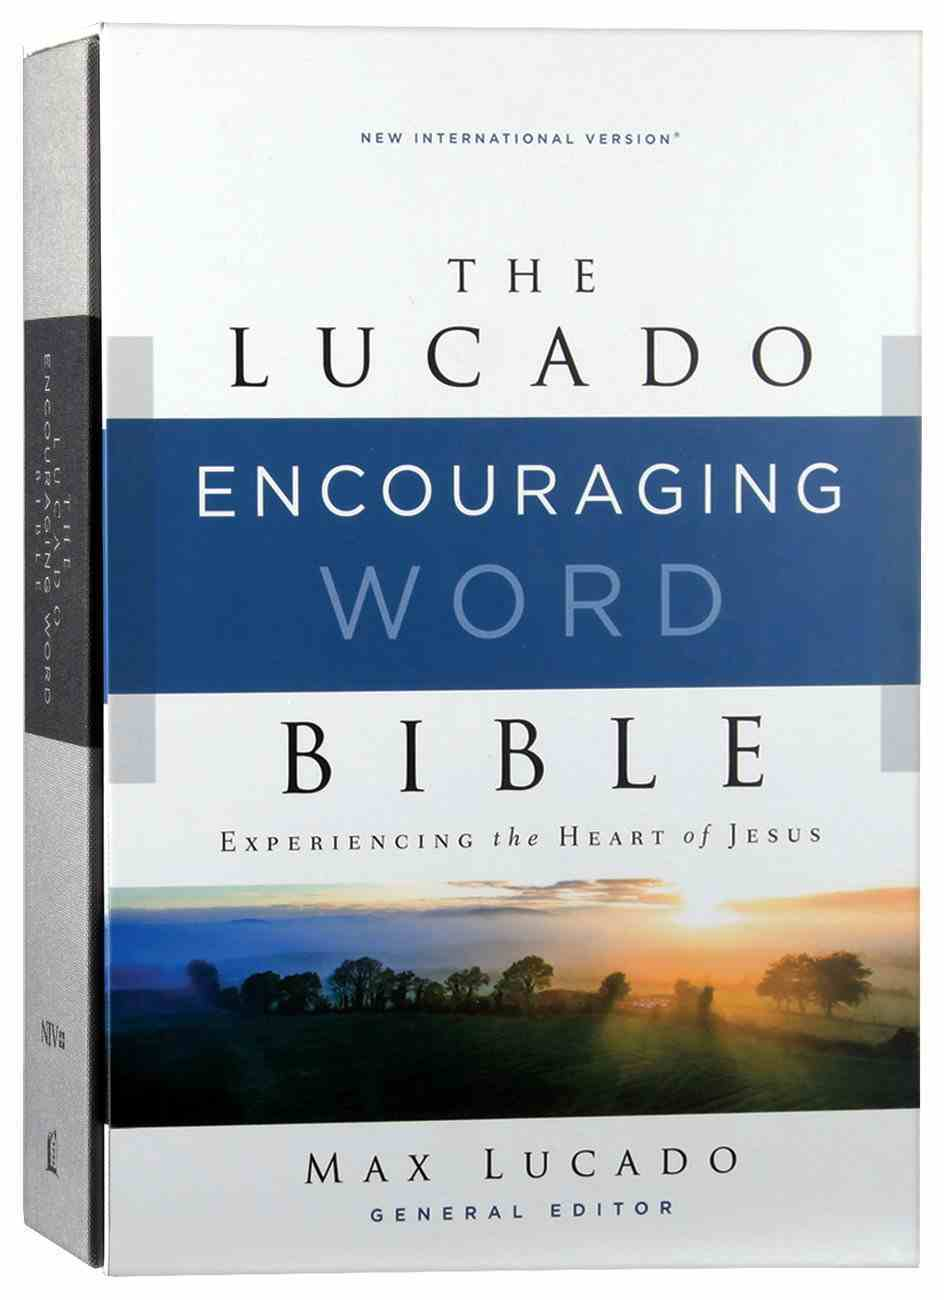 NIV Lucado Encouraging Word Bible Gray Fabric Over Hardback